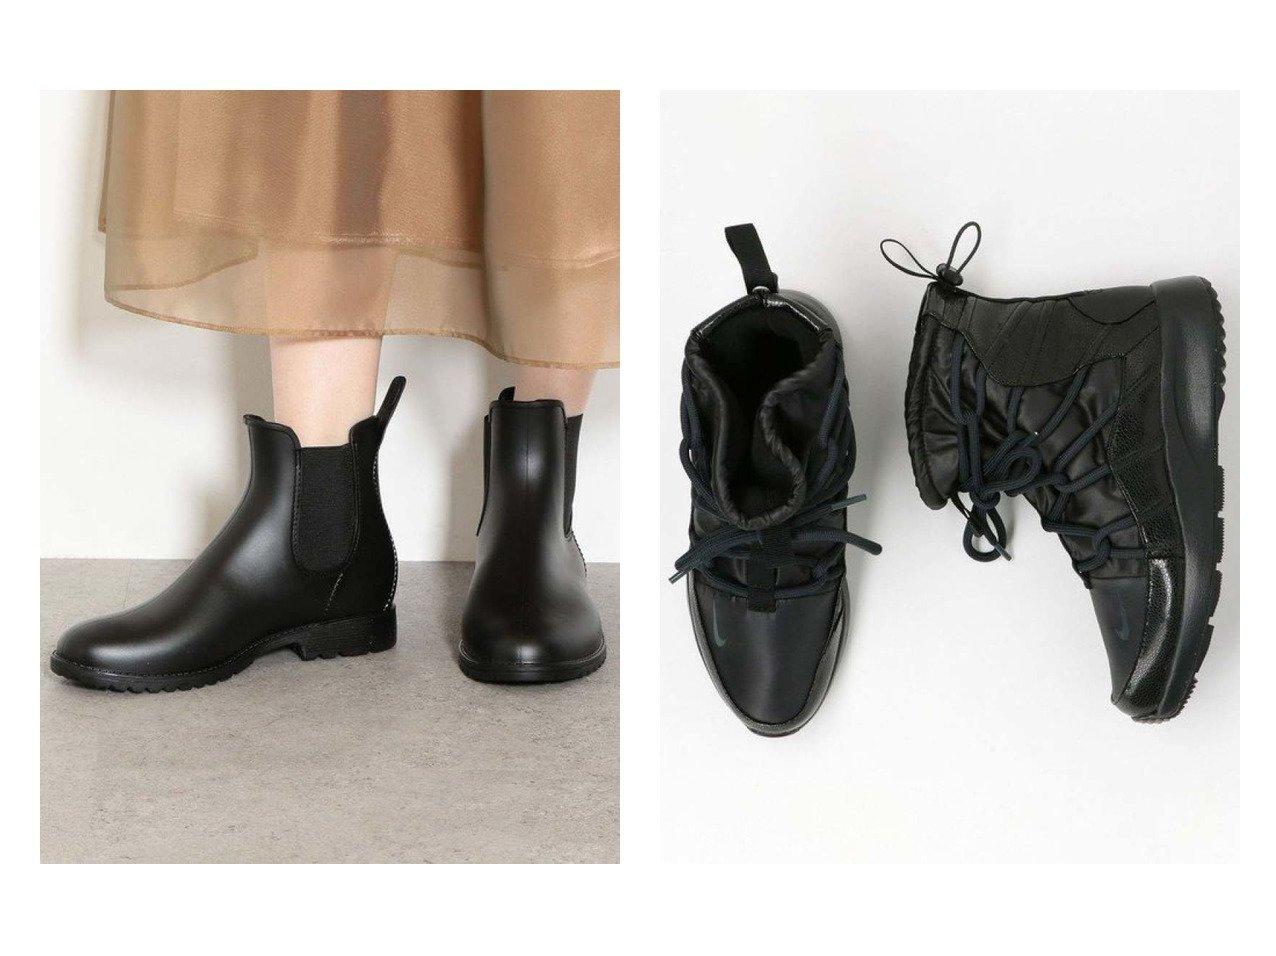 【green label relaxing / UNITED ARROWS/グリーンレーベル リラクシング / ユナイテッドアローズ】のNIKE(ナイキ)タンジュン HIGH RISE【EMMEL REFINES】&SC サイドゴアレインブーツ シューズ・靴のおすすめ!人気、トレンド・レディースファッションの通販  おすすめで人気の流行・トレンド、ファッションの通販商品 メンズファッション・キッズファッション・インテリア・家具・レディースファッション・服の通販 founy(ファニー) https://founy.com/ ファッション Fashion レディースファッション WOMEN シューズ ショート シンプル スニーカー スポーティ スリッポン モノトーン 冬 Winter |ID:crp329100000010828